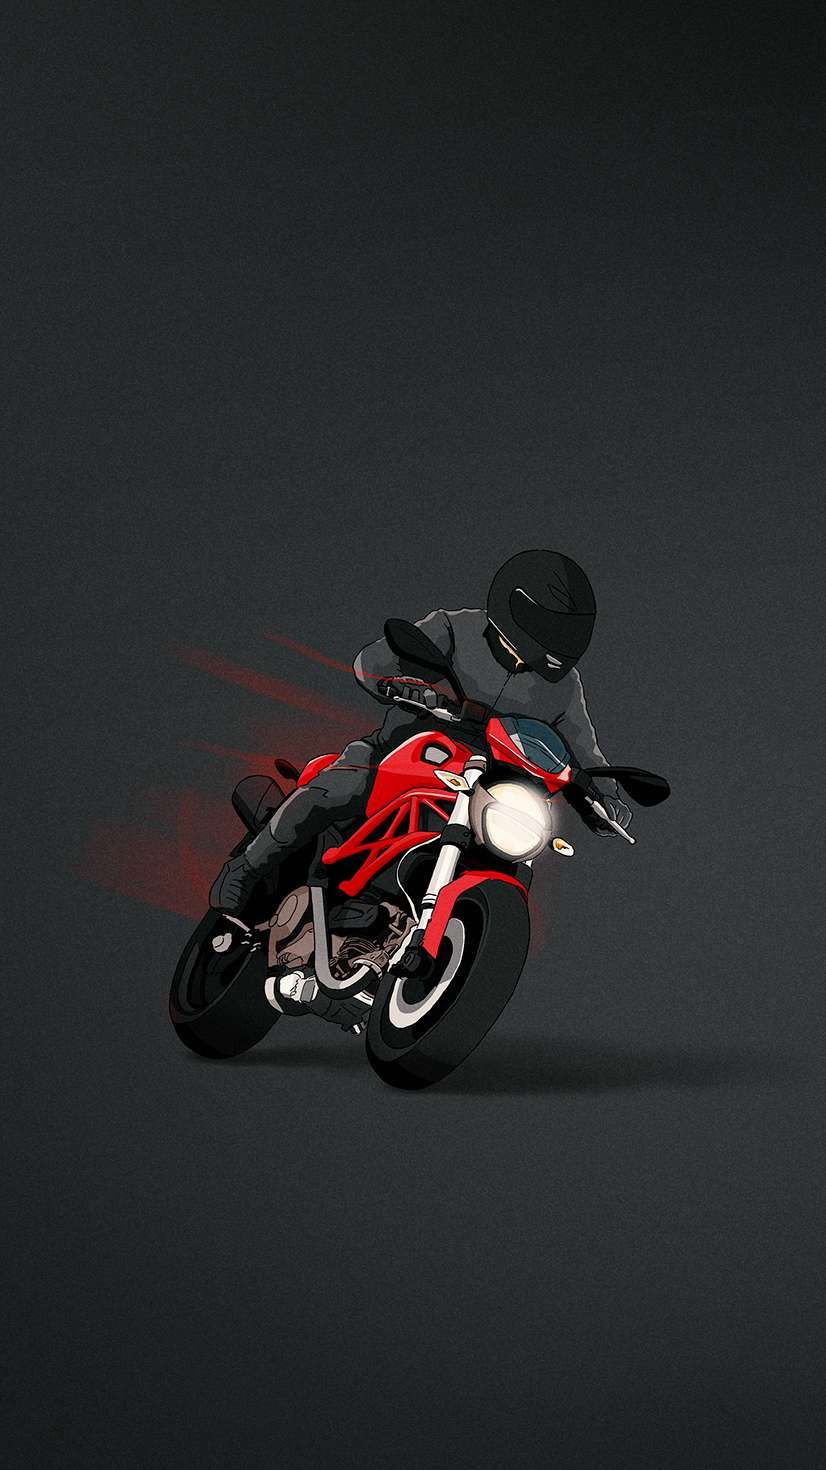 Ducati Monster Ducati Monster Bike Drawing Bike Photography